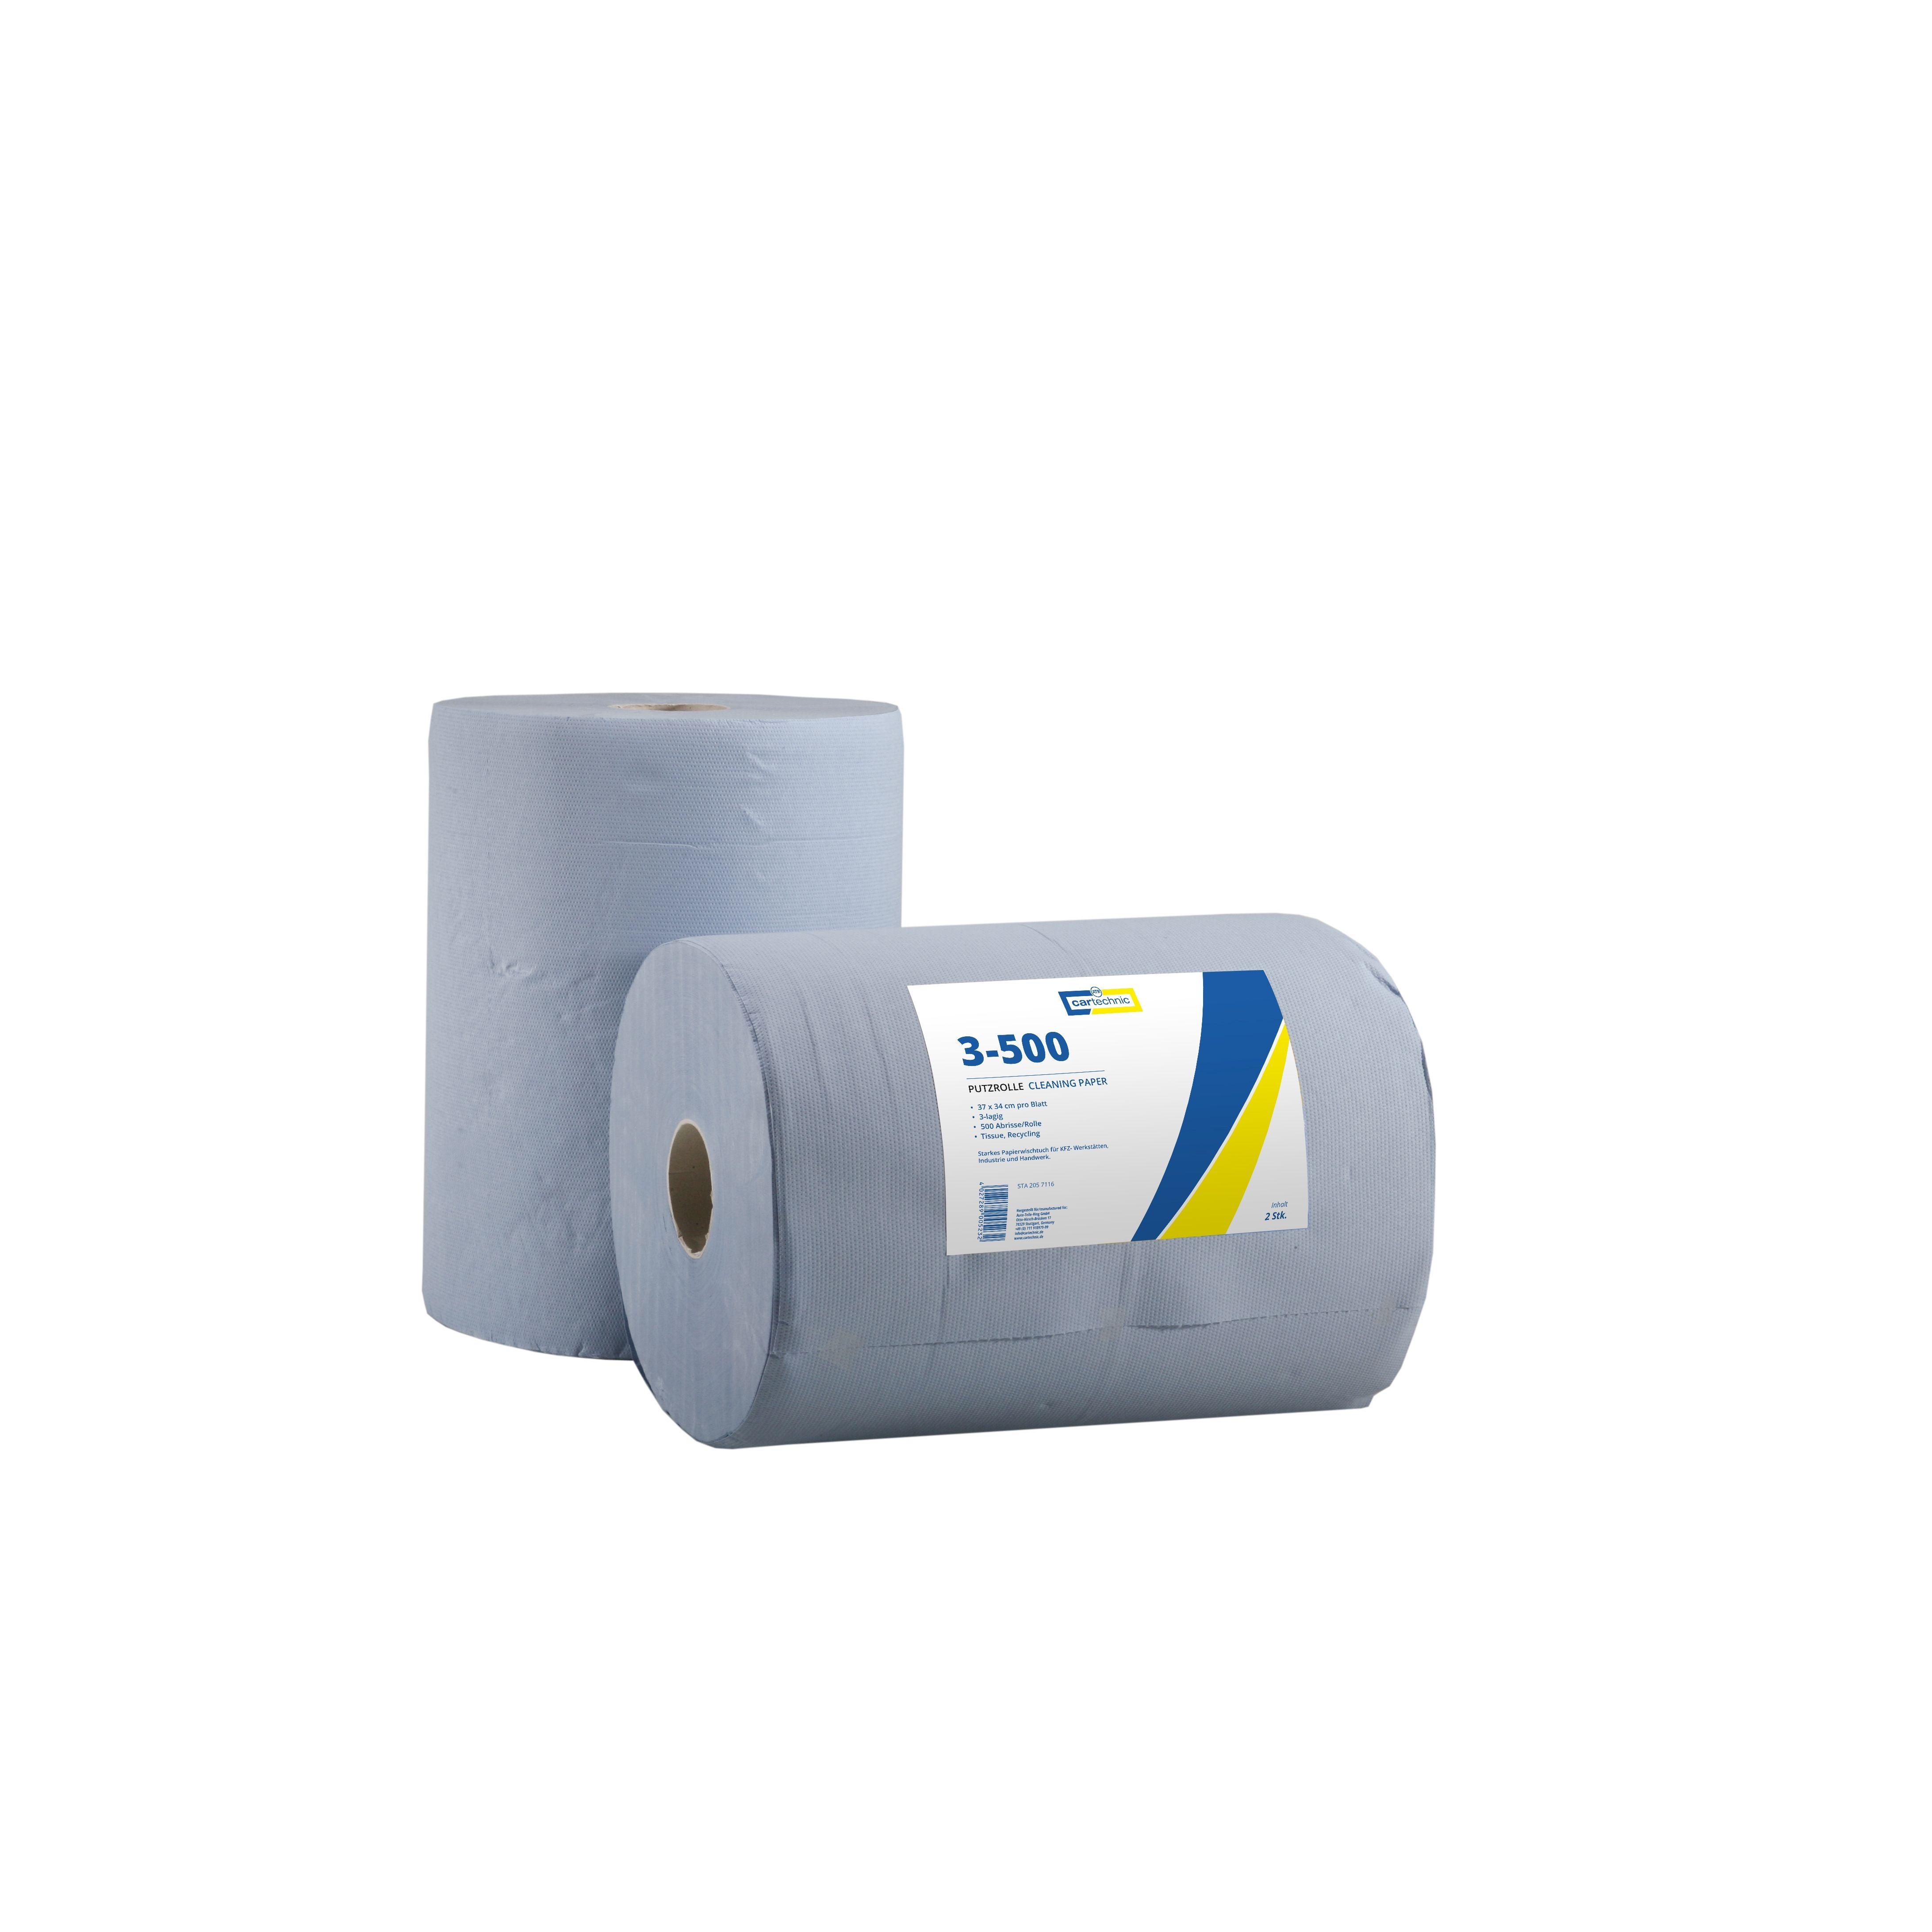 CARTECHNIC Papierrolle Putzrolle Werkstatt 3-lagig 500 Abrisse Blatt 34x37 4027289005232